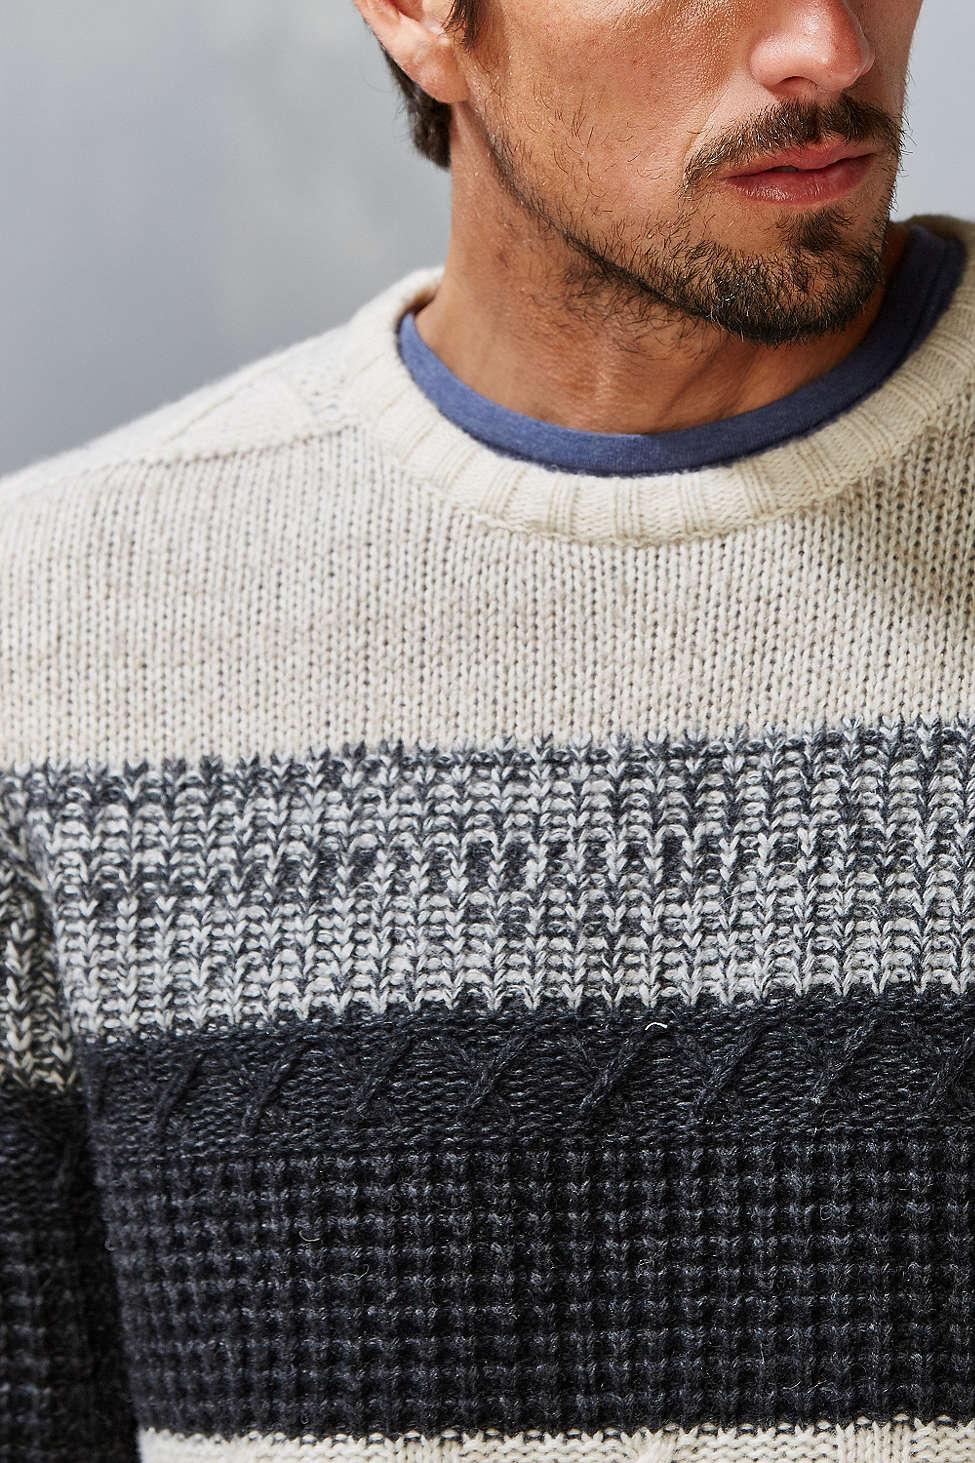 Urban Outfitters | CPO Woburn Aran Stripe Sweater